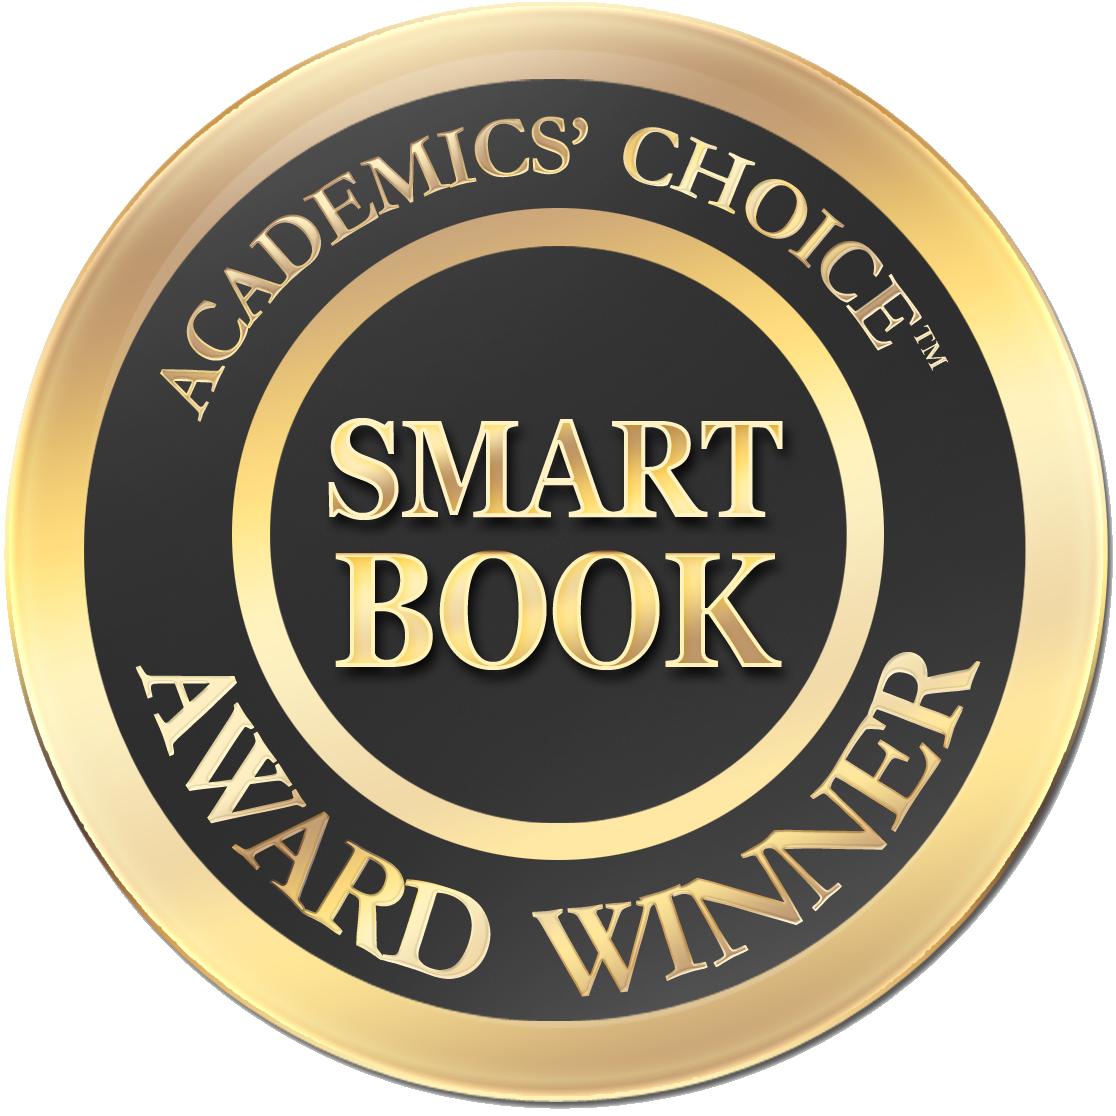 award-smart-book-lg-trans-38436.png